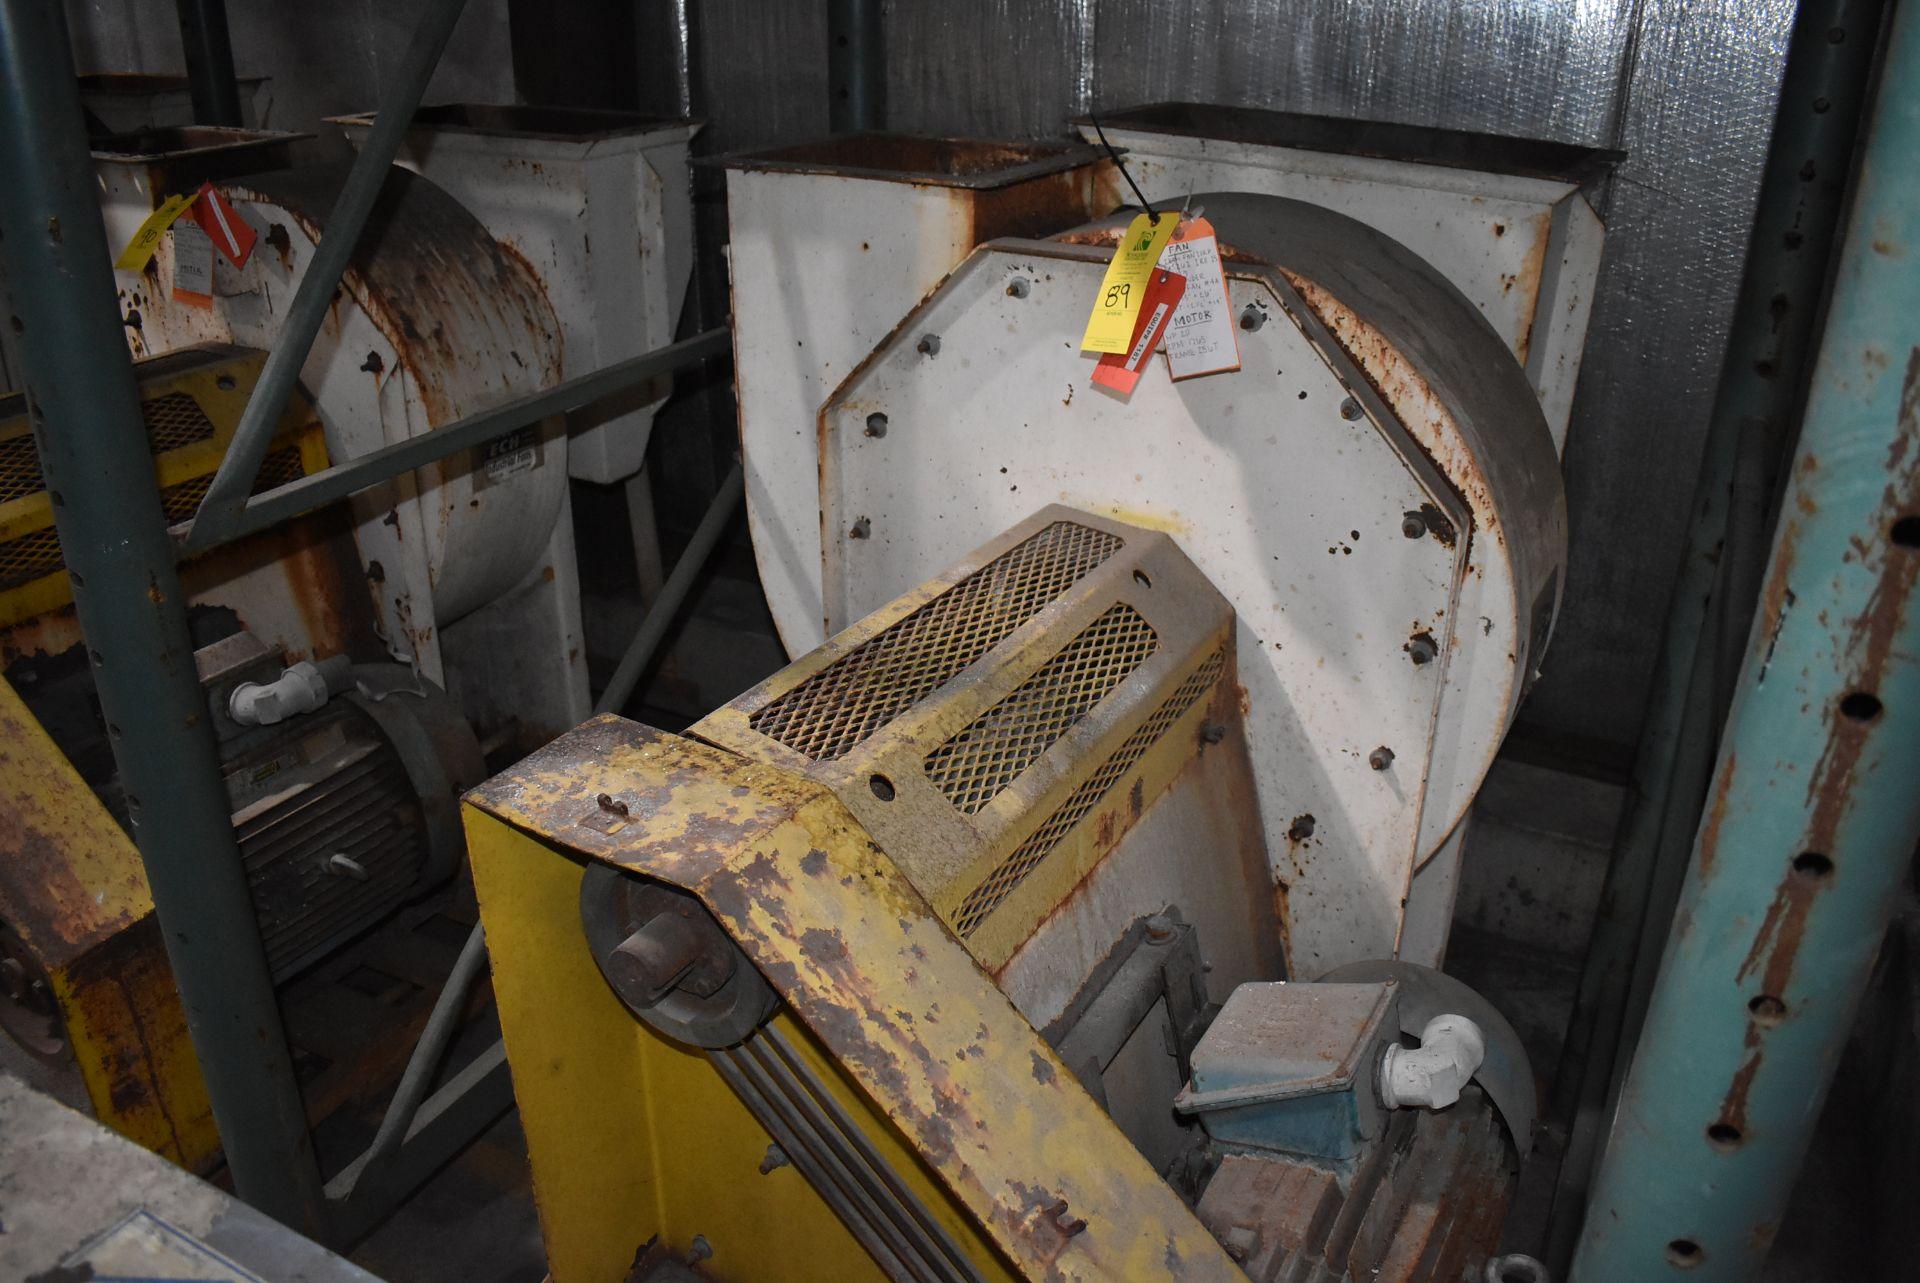 Air Tech Model #261 Blower w/20 HP Motor - Image 3 of 3